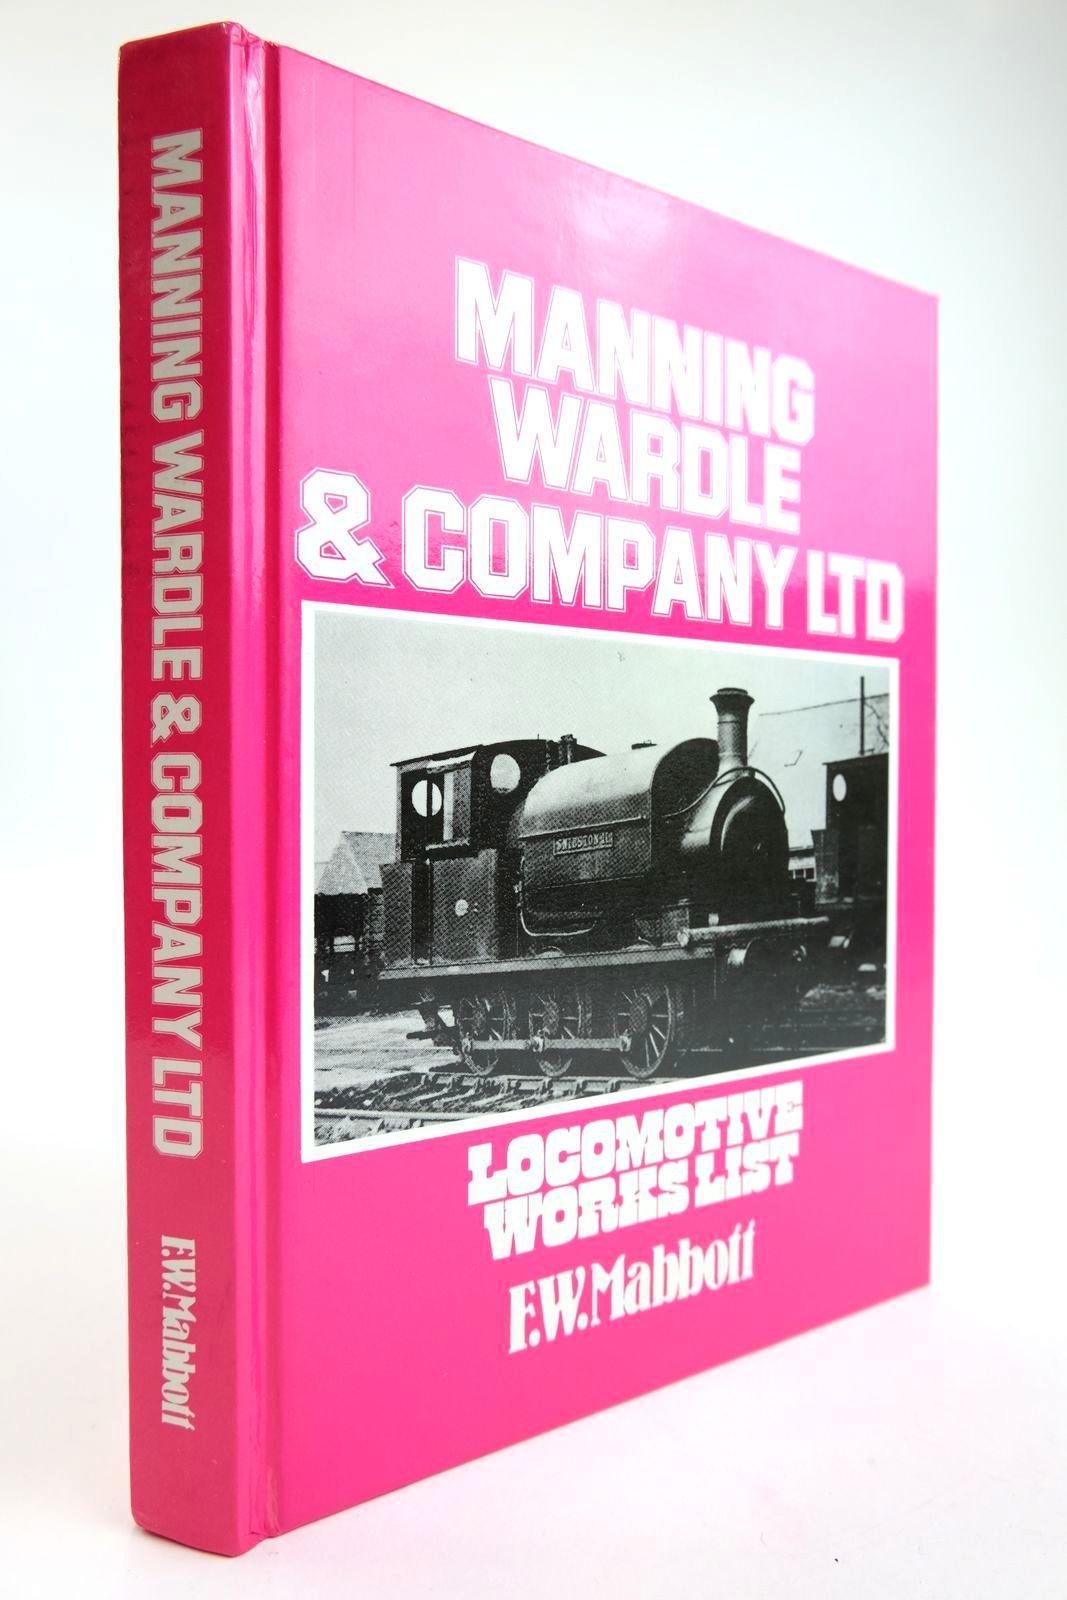 Photo of MANNING WARDLE & COMPANY LTD LOCOMOTIVE WORKS LIST